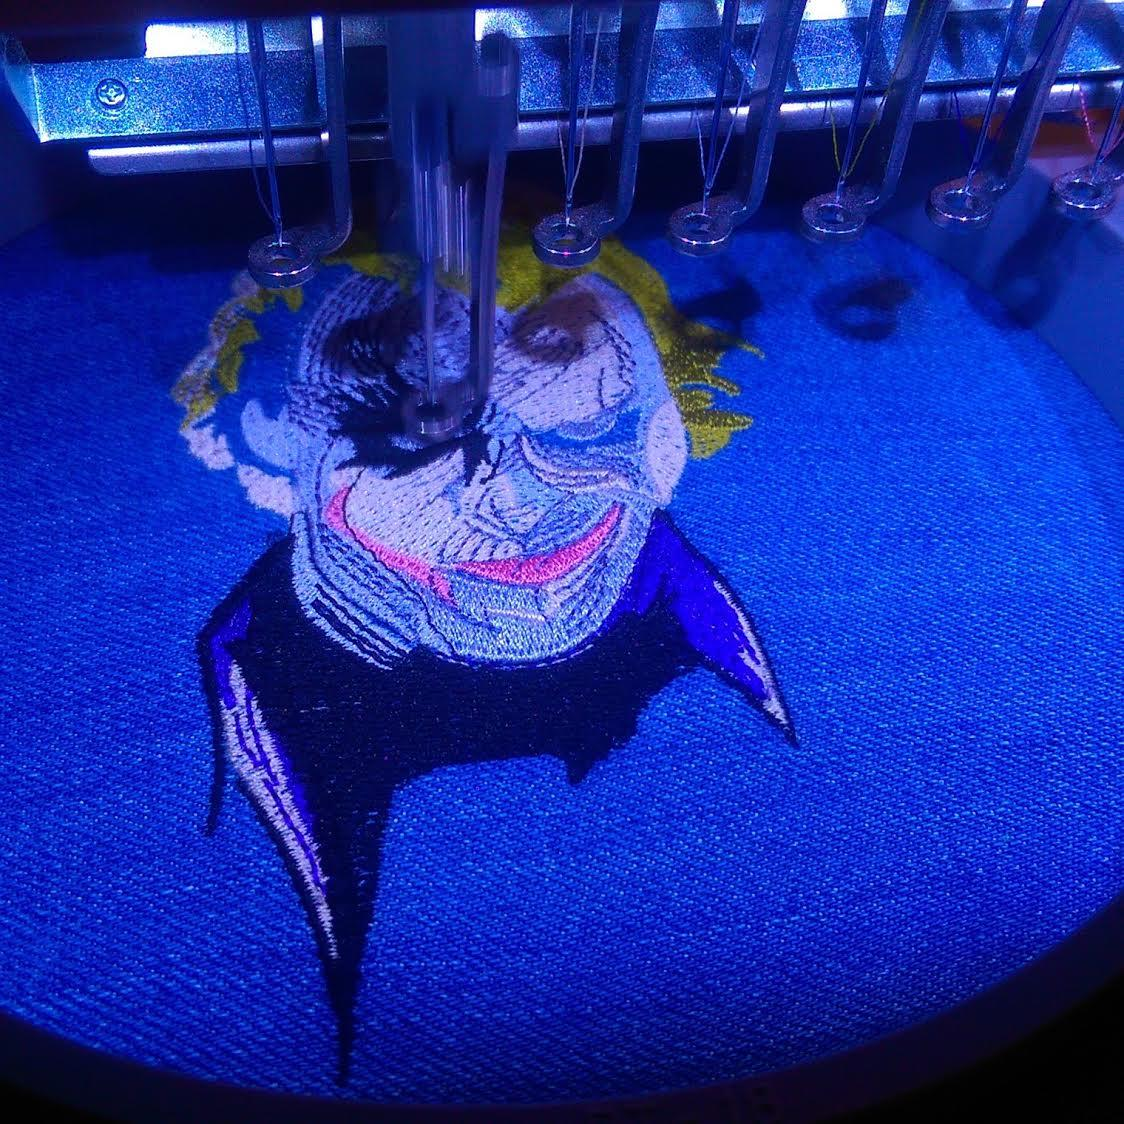 Making Joker's smirk embroidery design